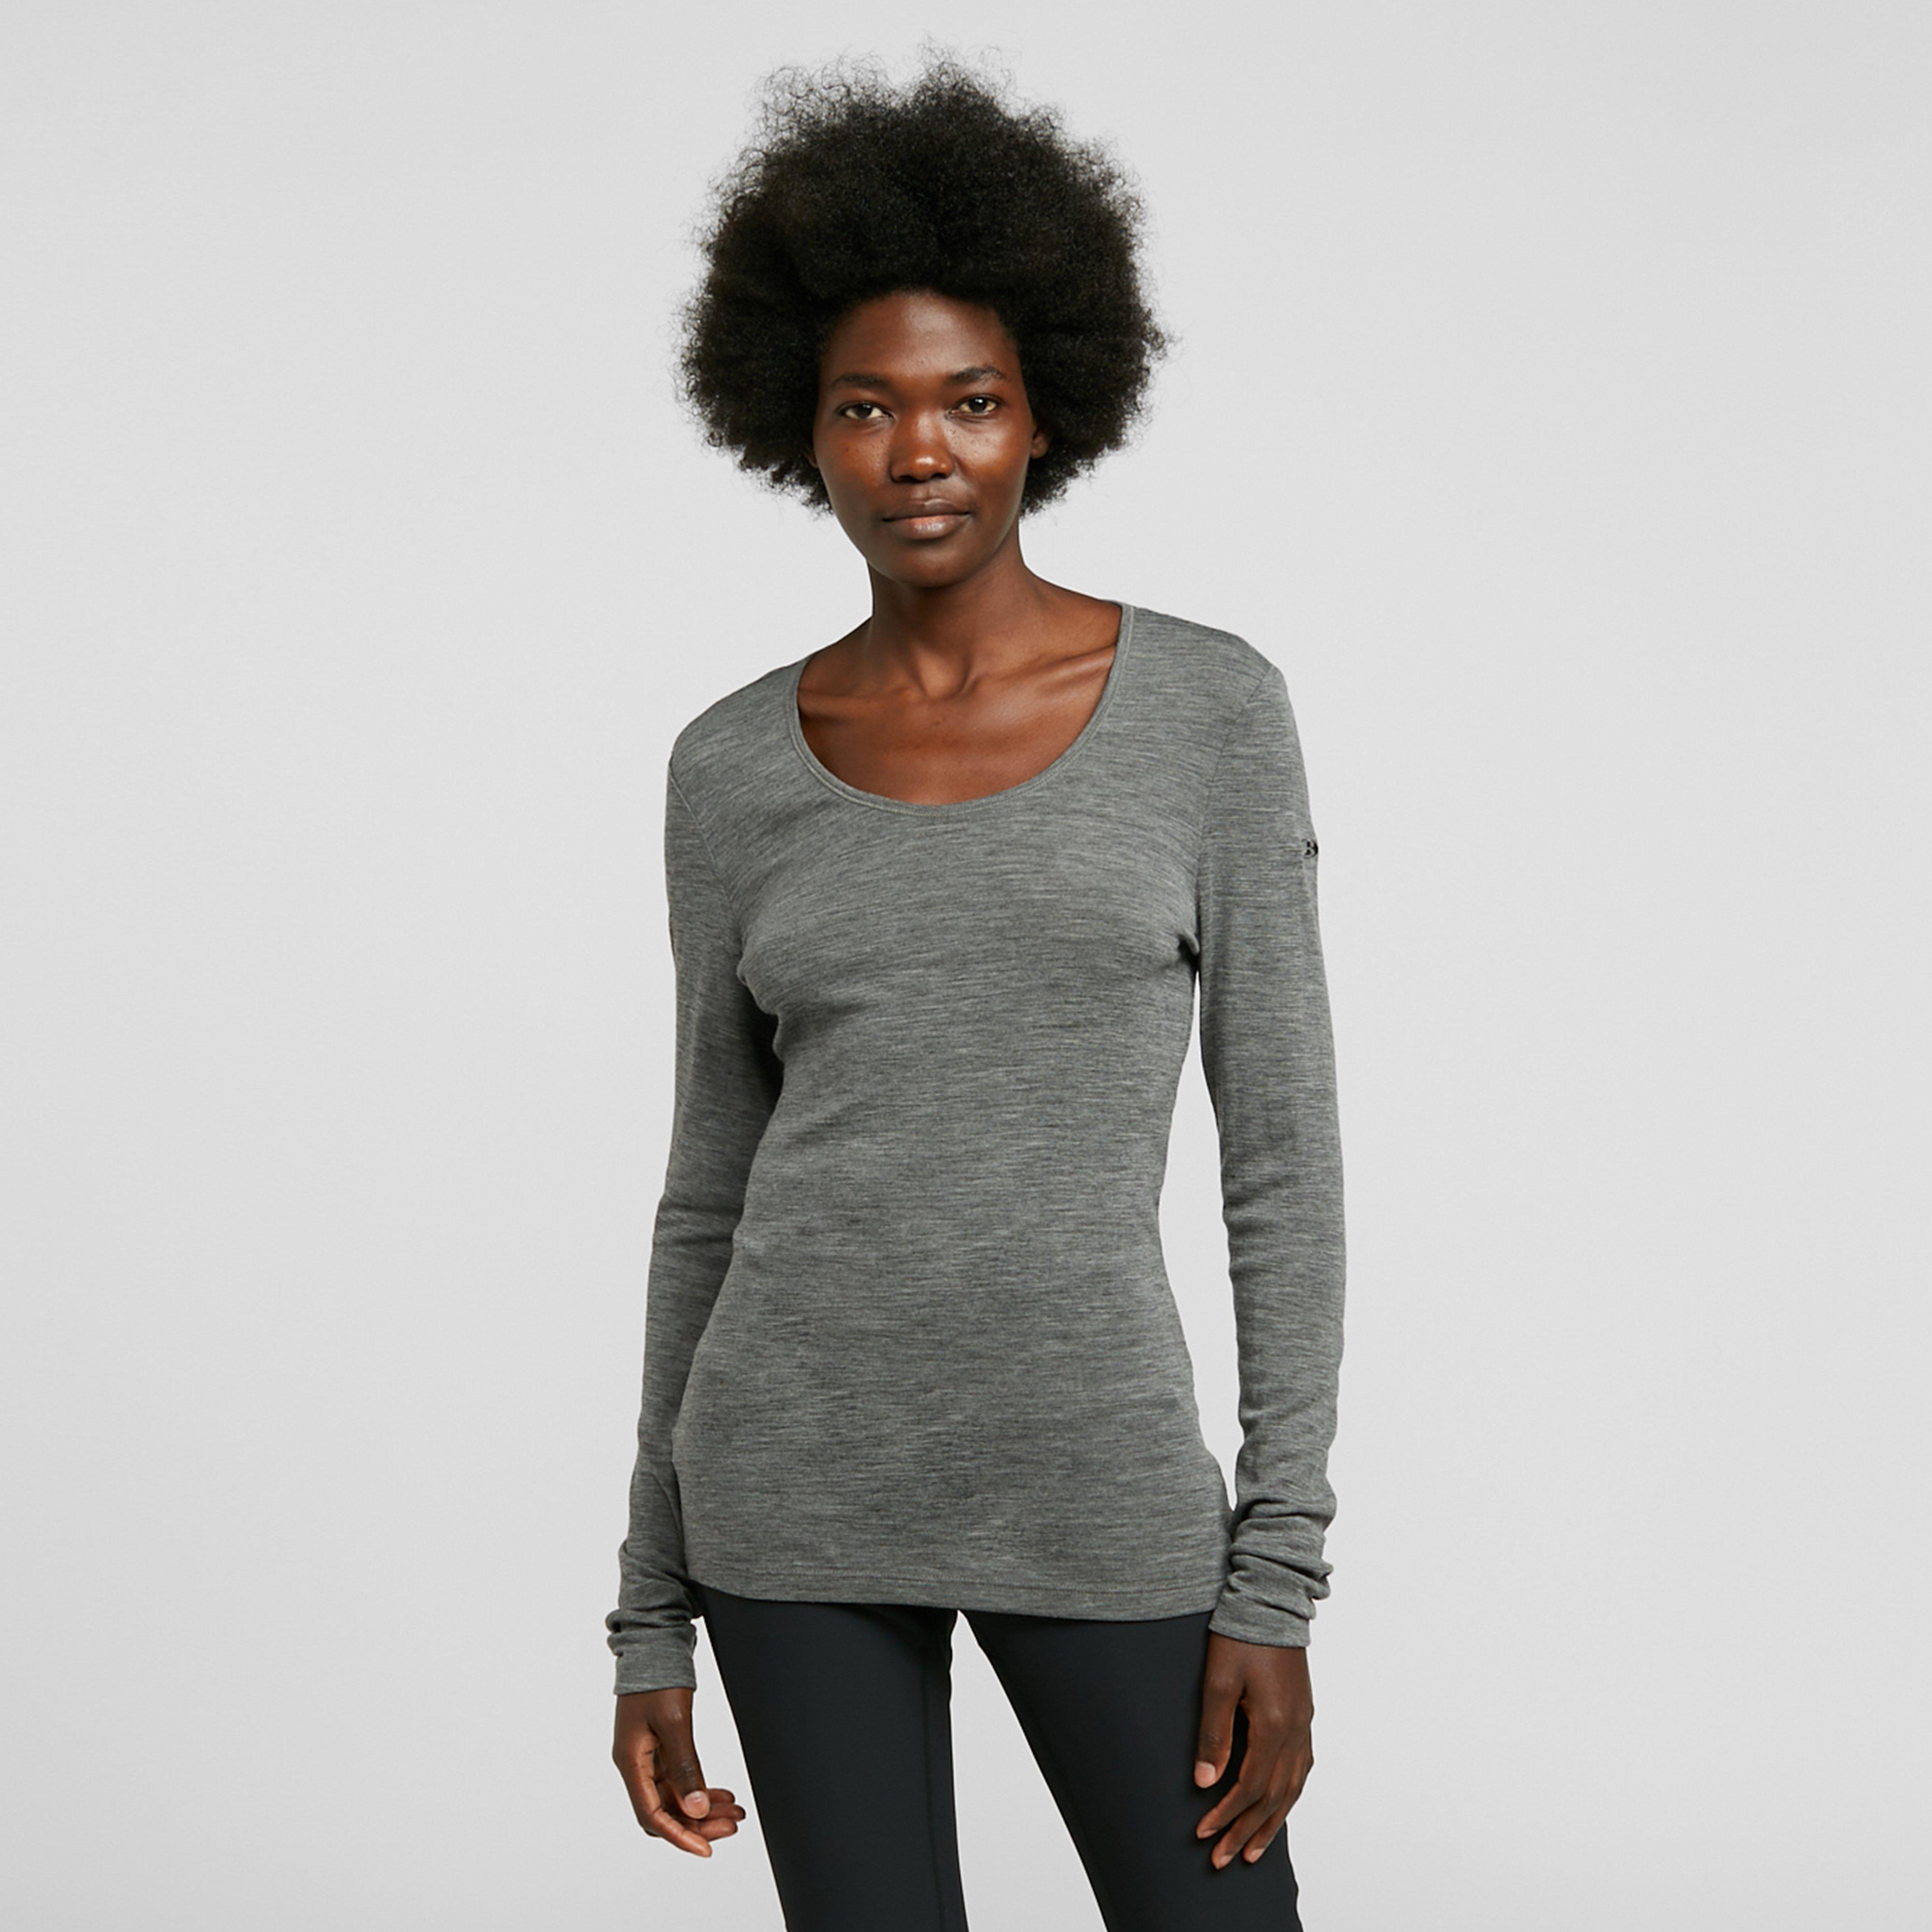 Image of Icebreaker Women's Merino 175 Everyday Long Sleeve Thermal Top - Grey/Scoop, Grey/SCOOP